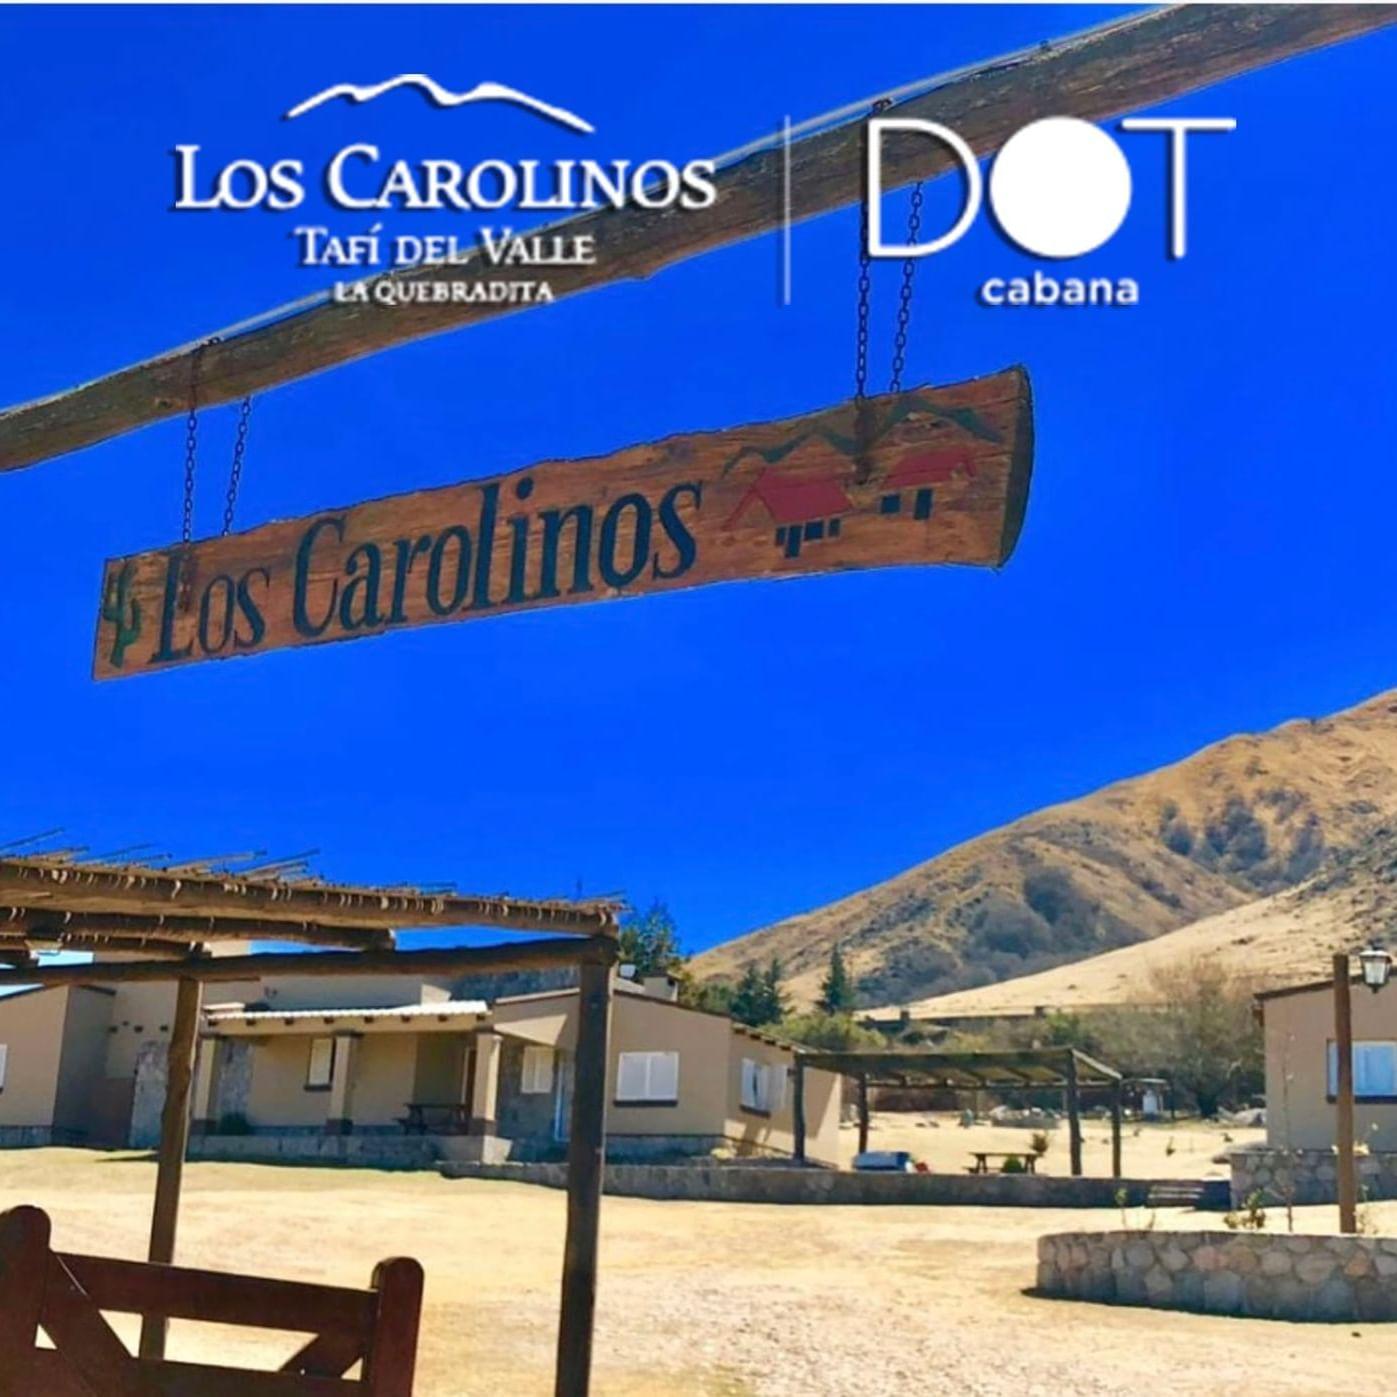 Los Carolinos by DOT Cabana